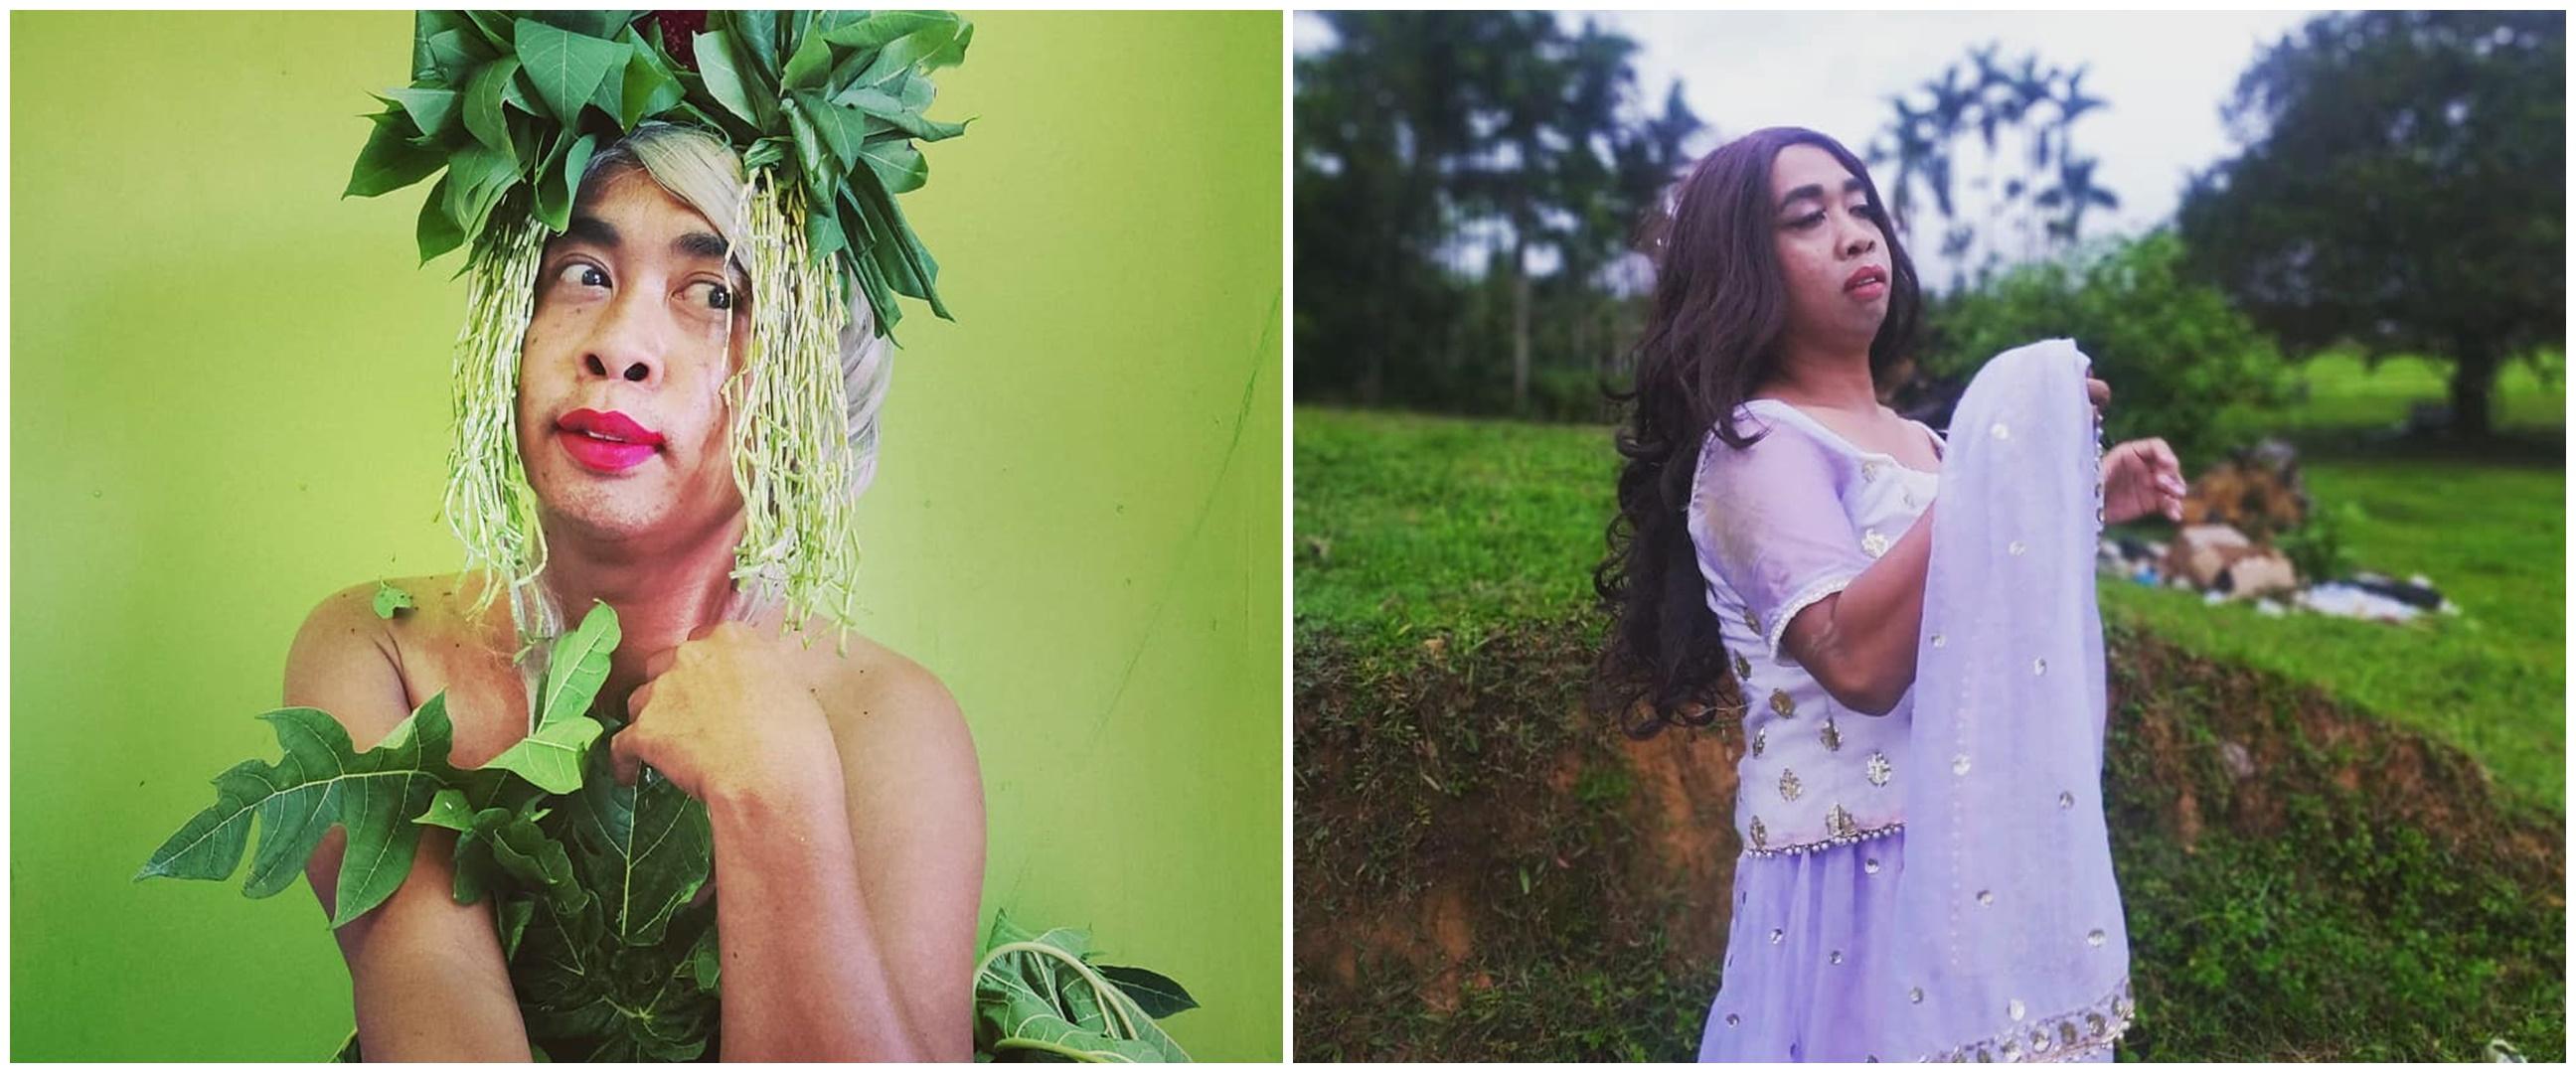 Mimi Peri unggah foto KTP, penampilan lawasnya curi perhatian